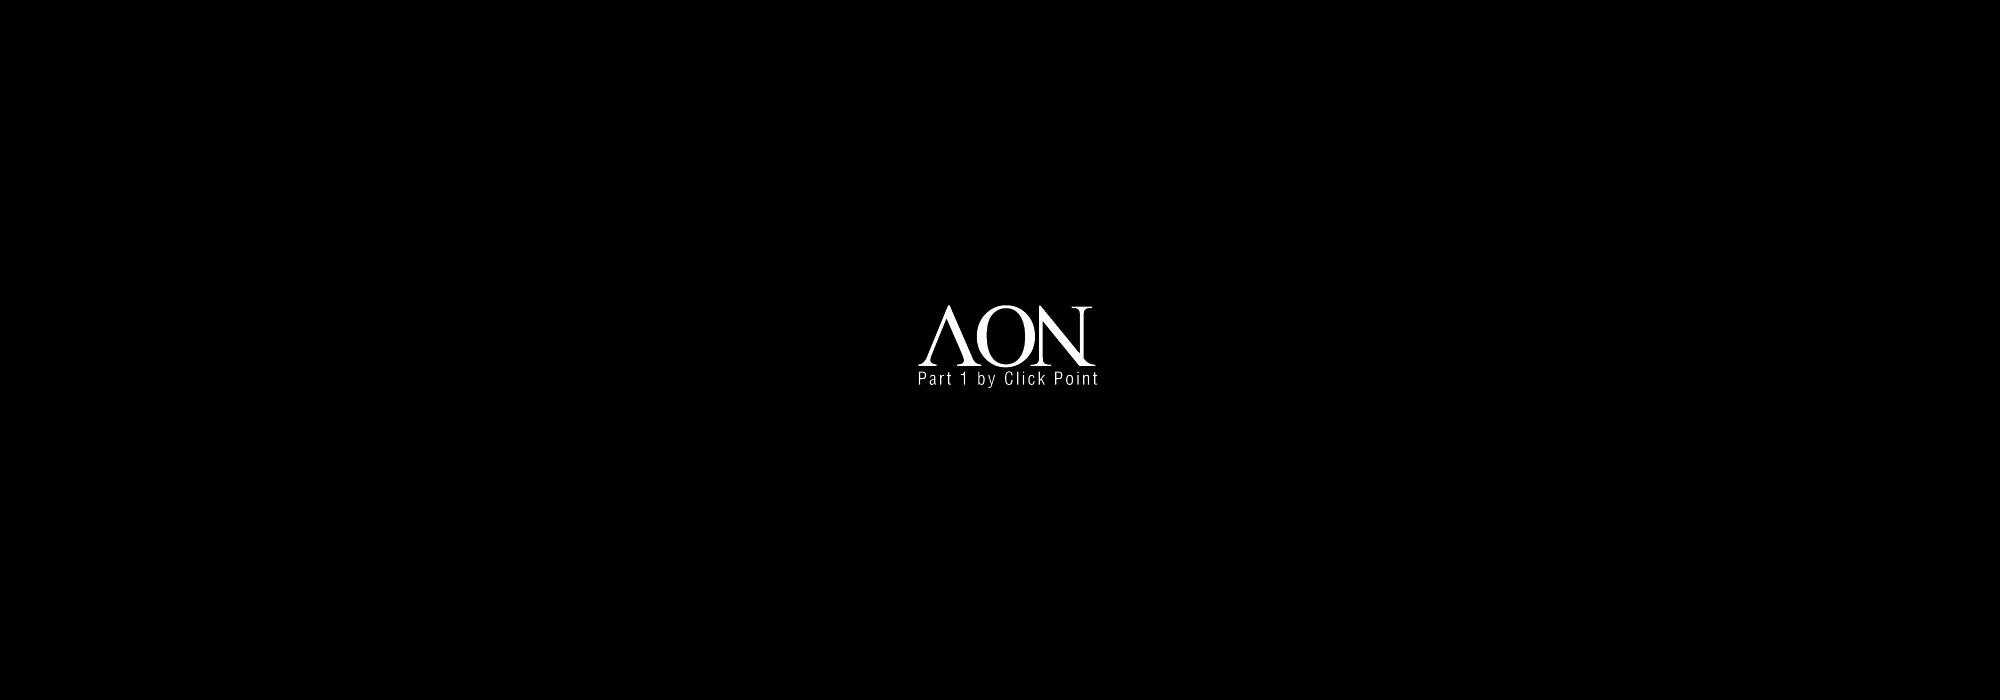 AON Part 1 Background